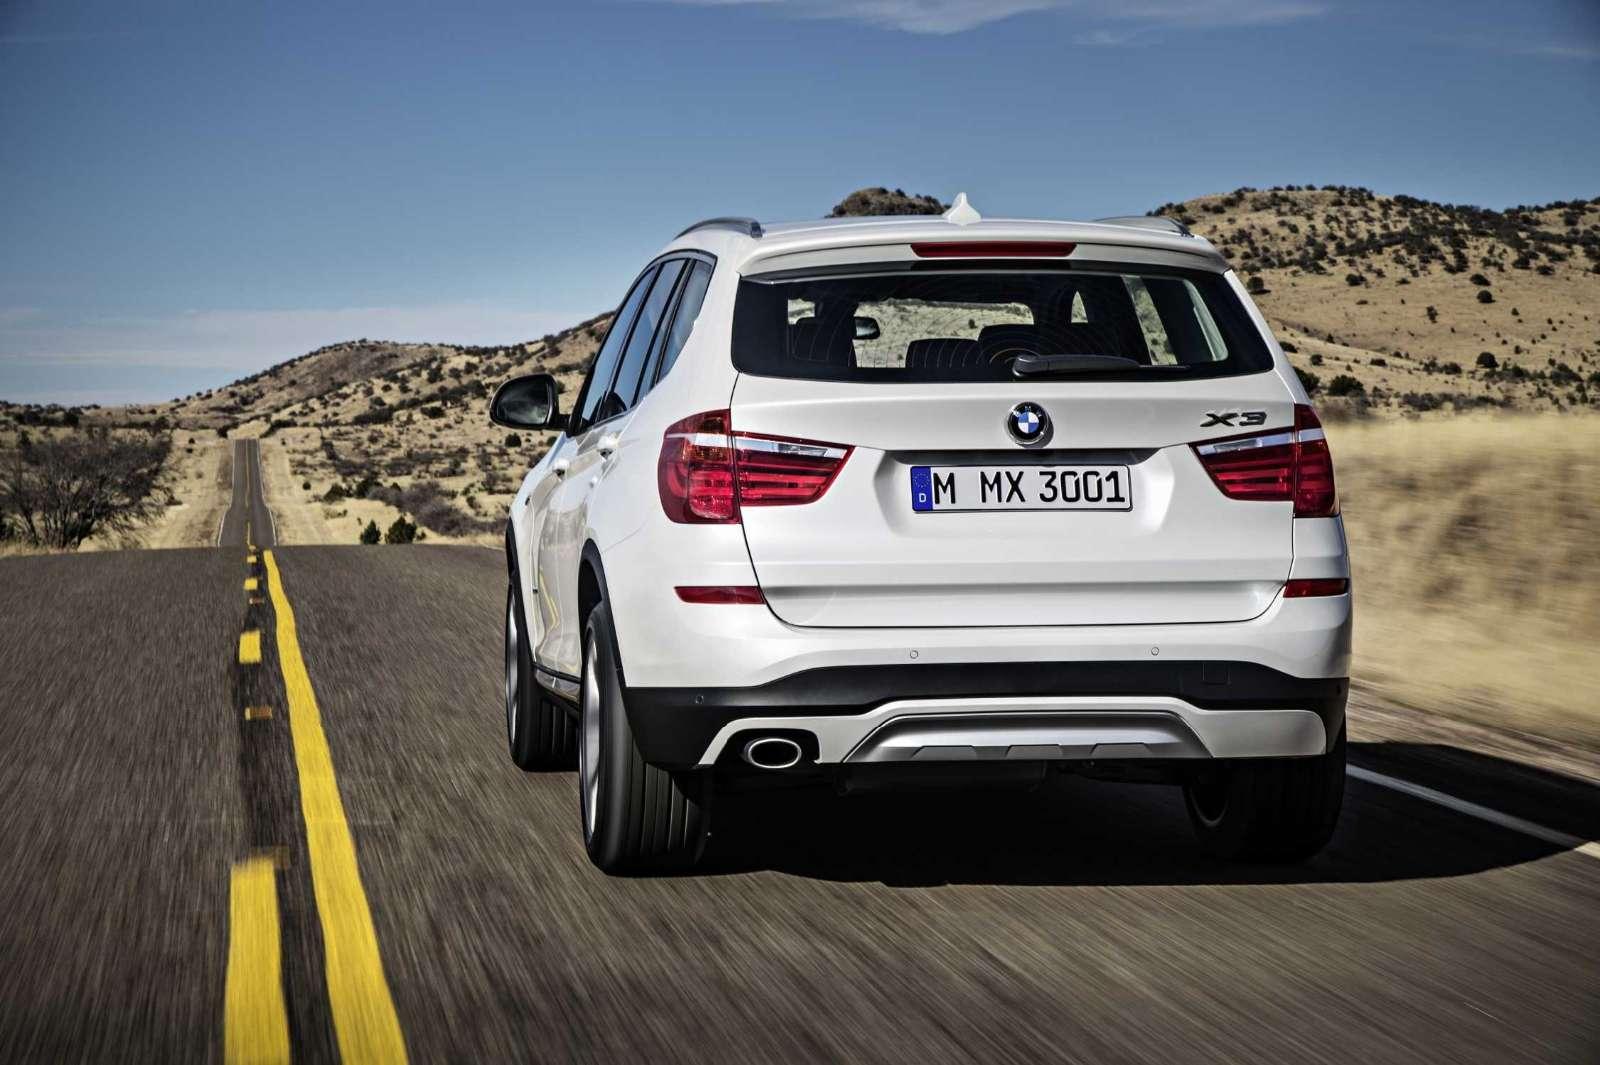 BMW X3 2015 Facelift